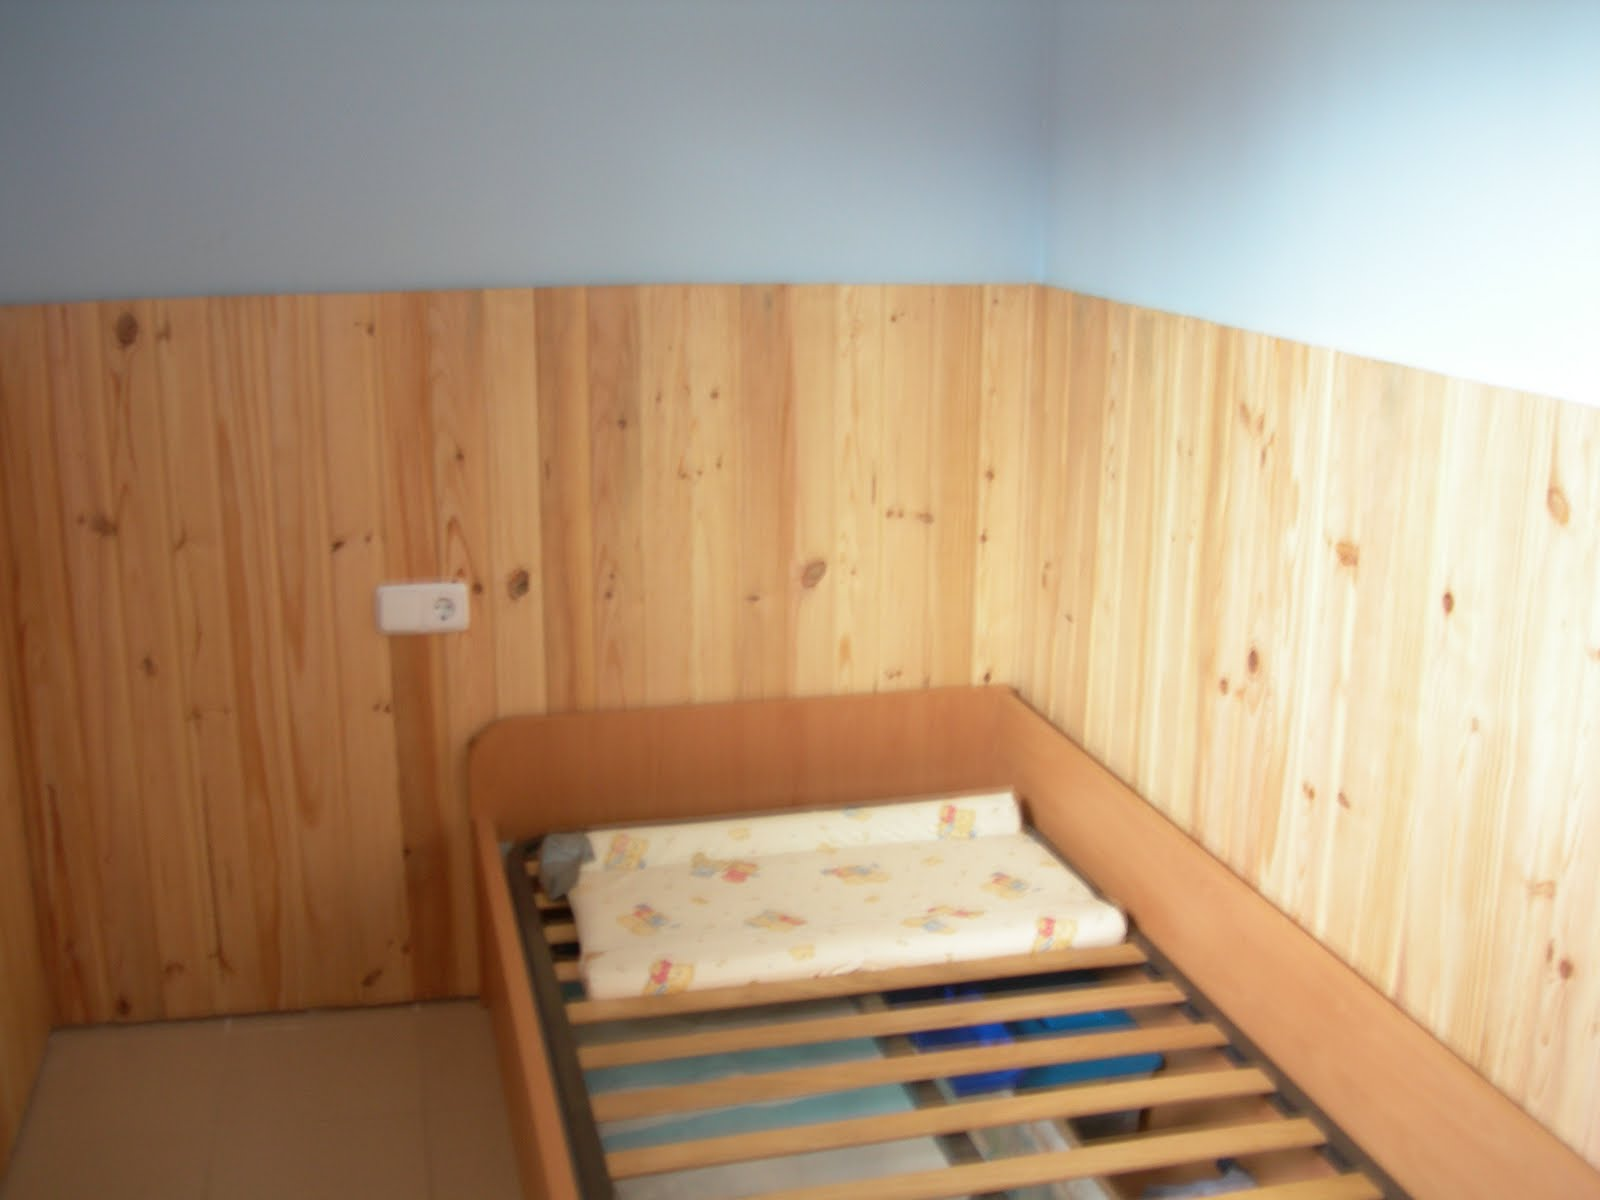 C mo decorar la casa friso madera - Friso para pared ...